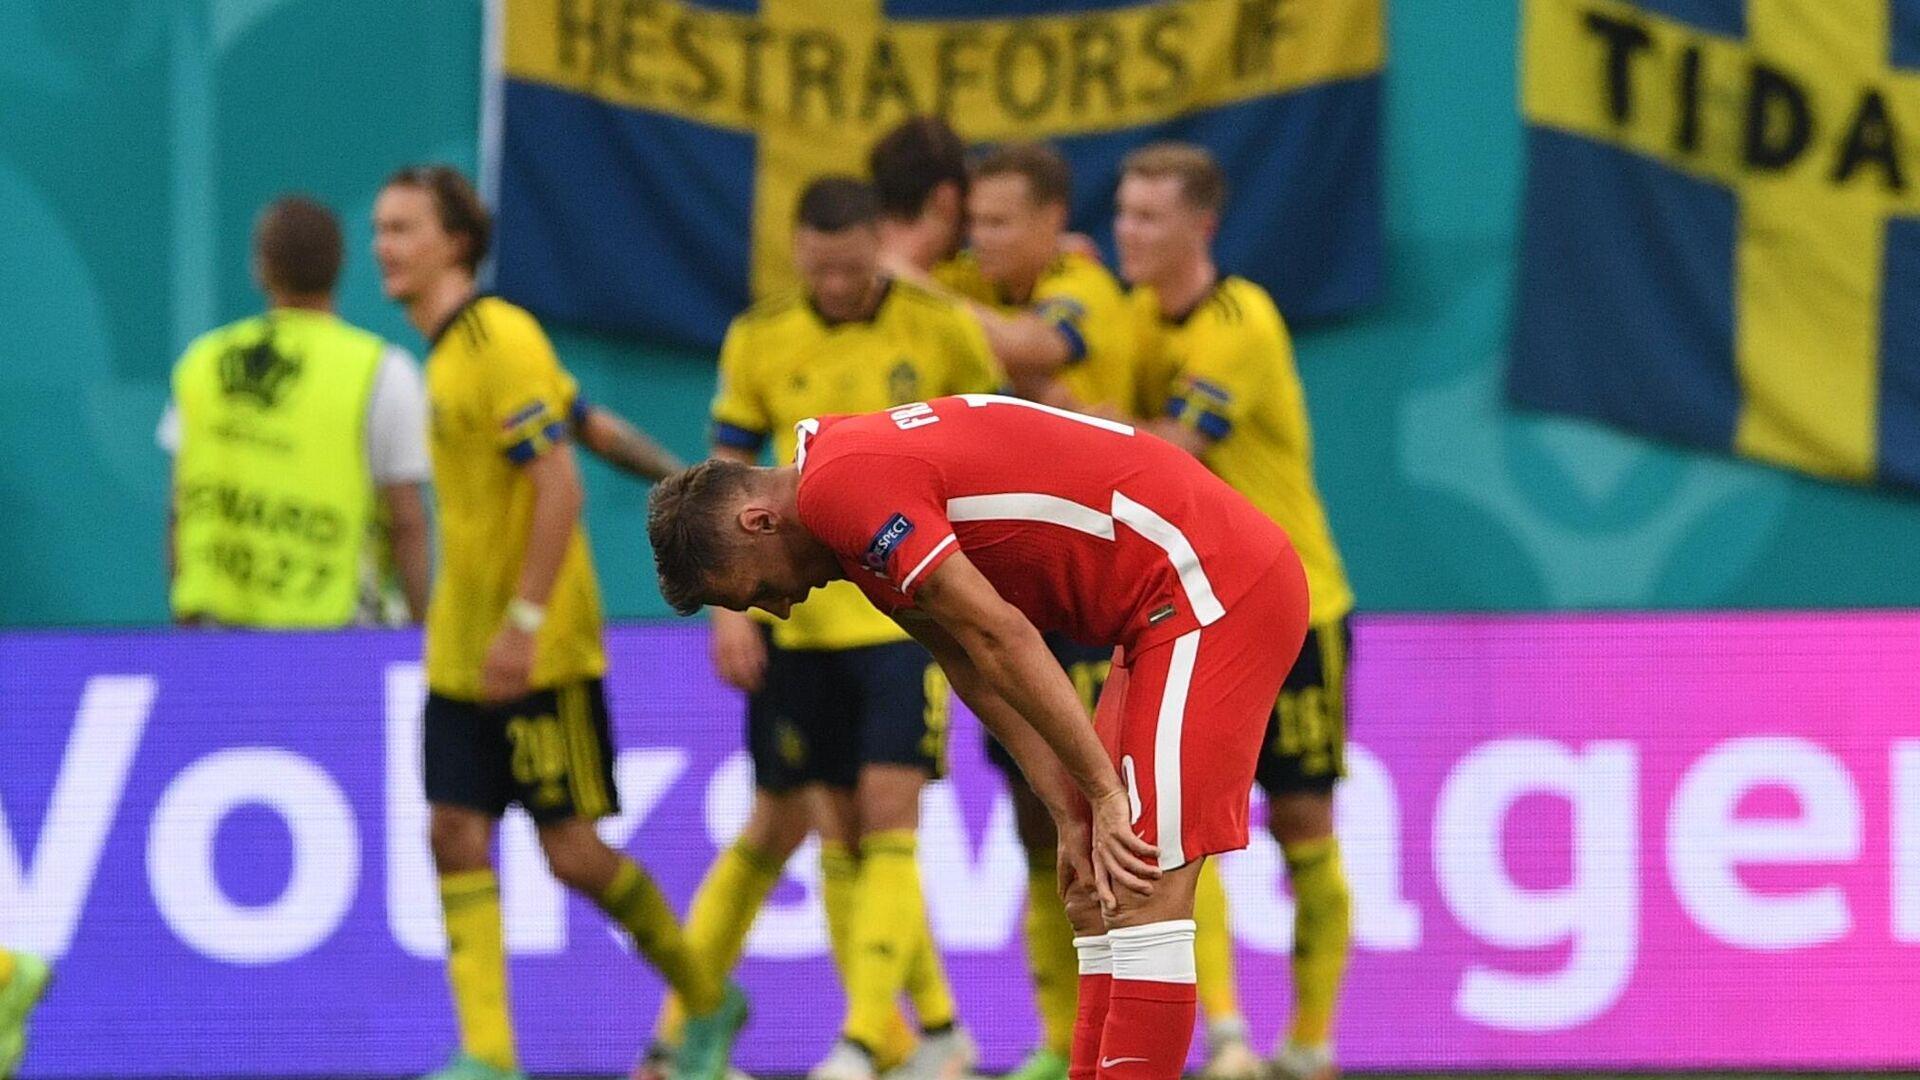 Polska-Szwecja mecz grupy E na Euro 2020  - Sputnik Polska, 1920, 23.06.2021